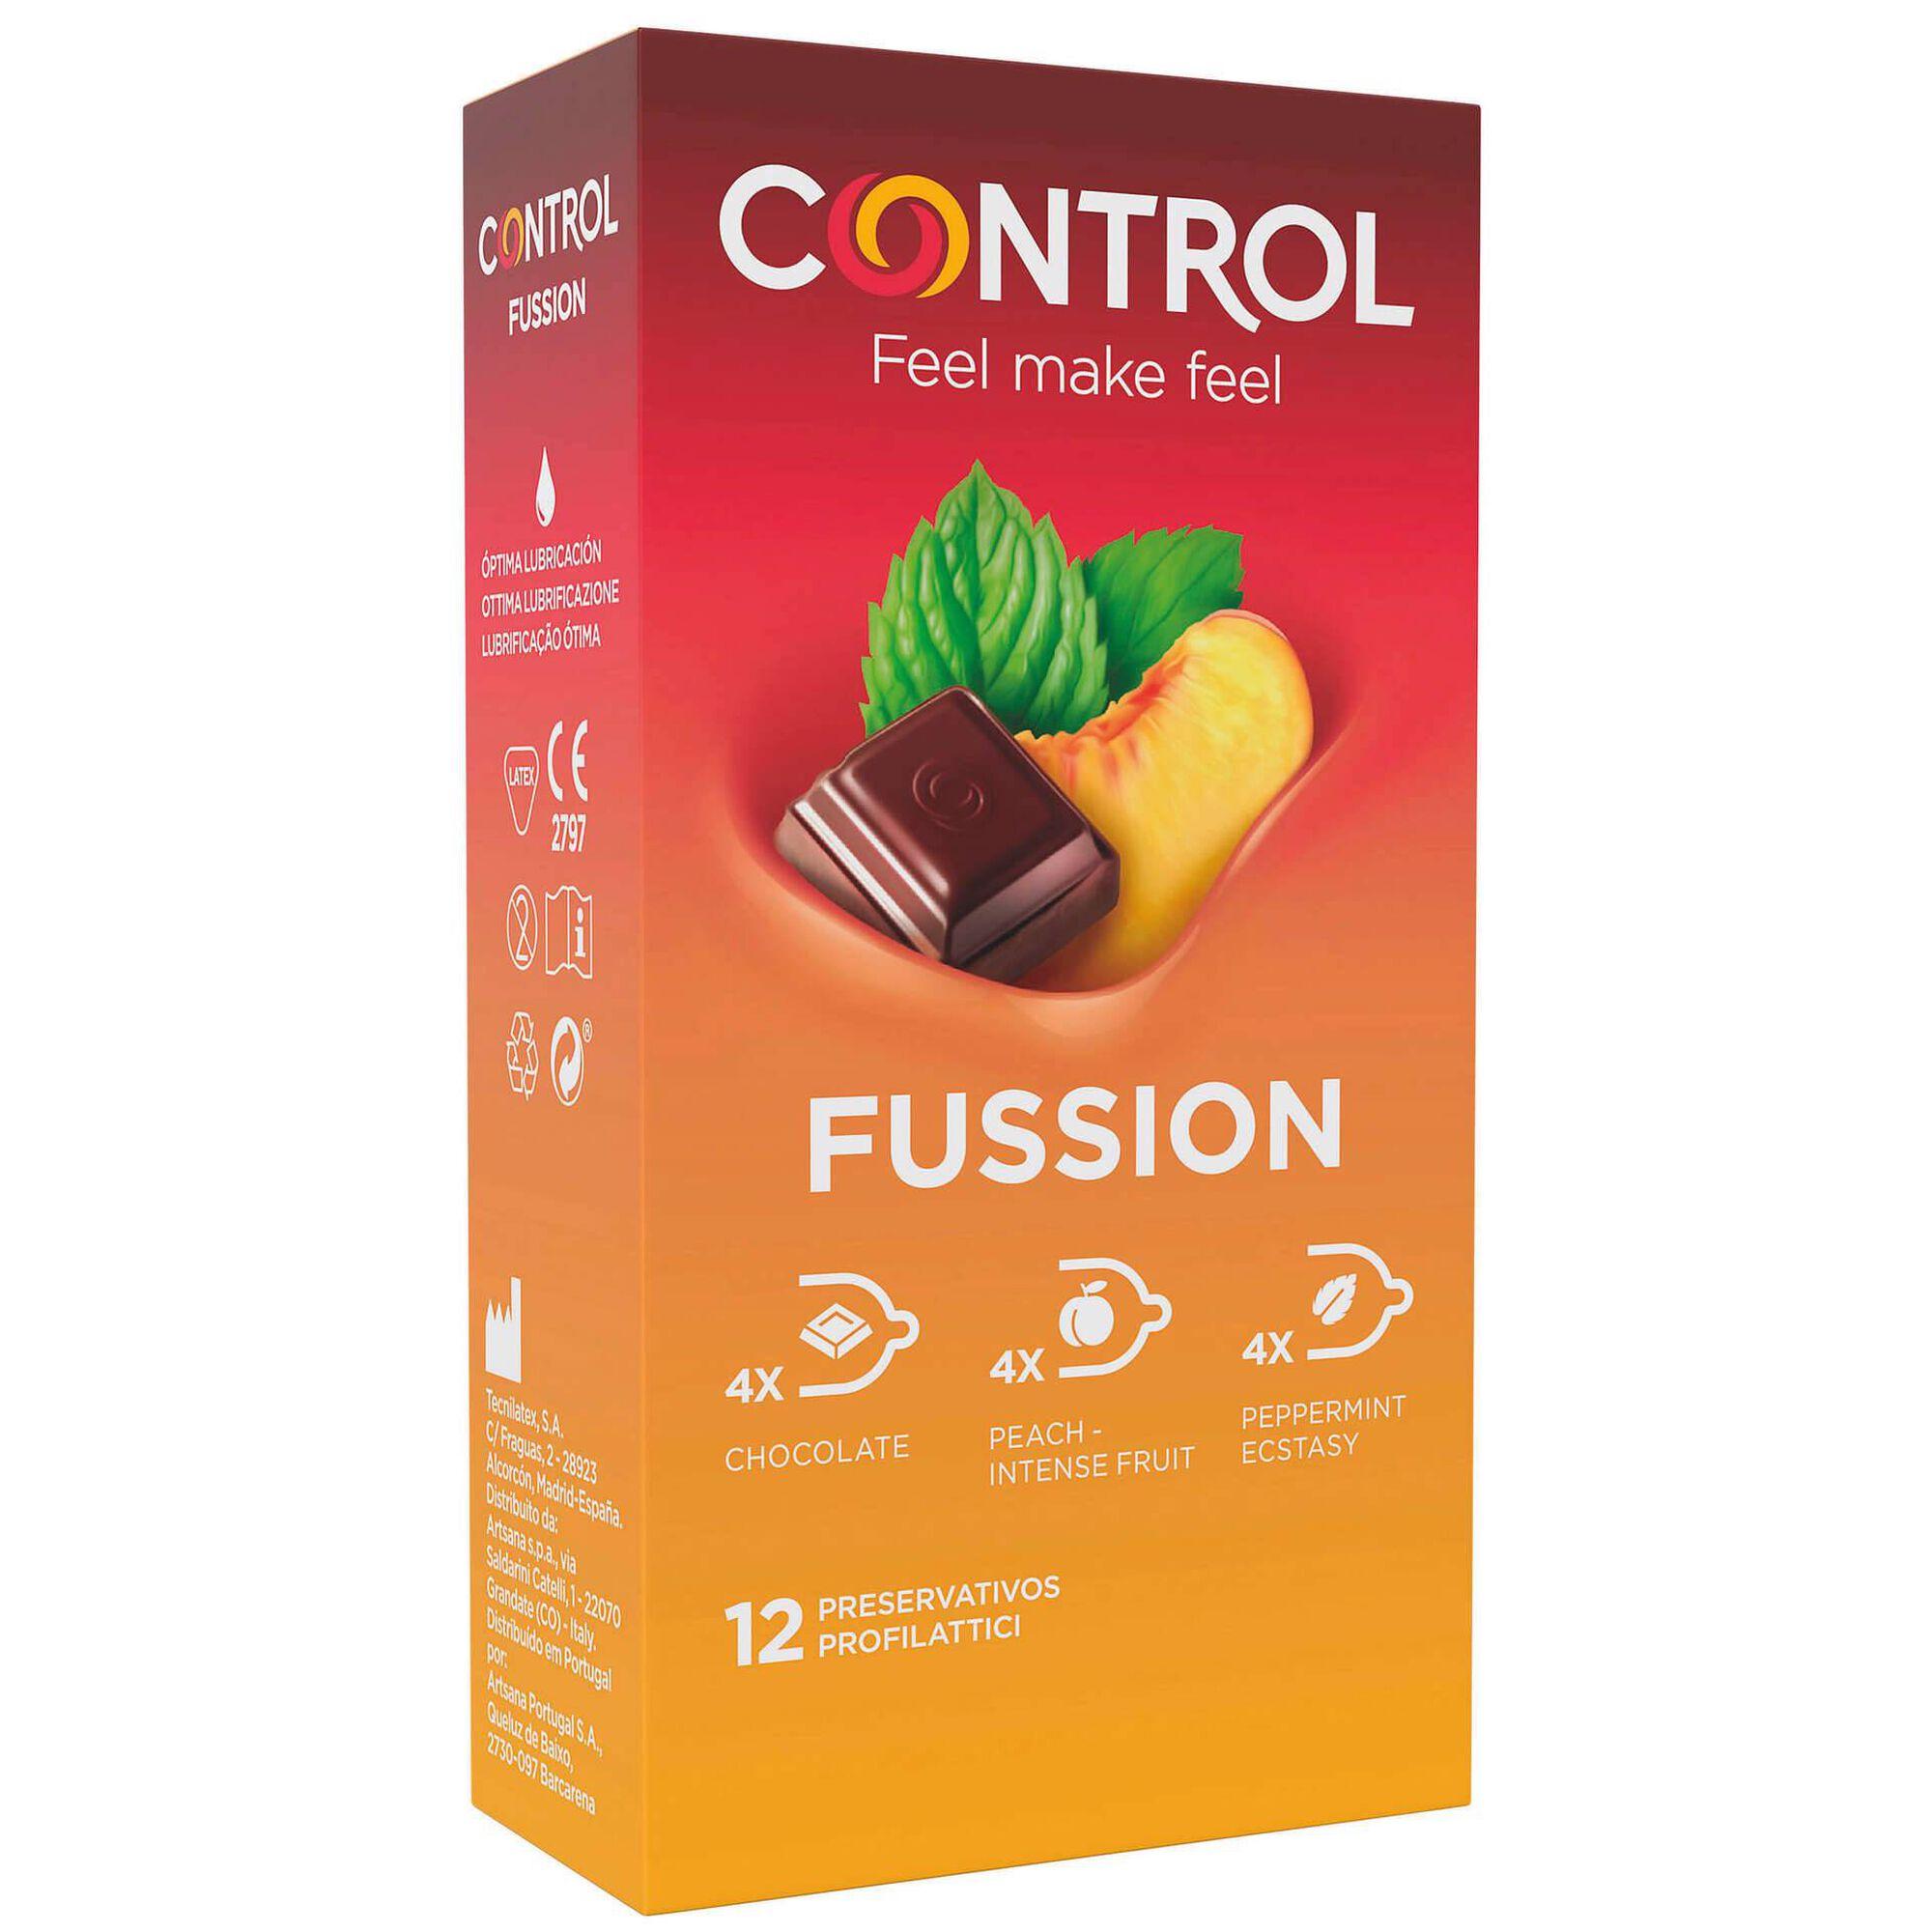 Preservativos Fussion